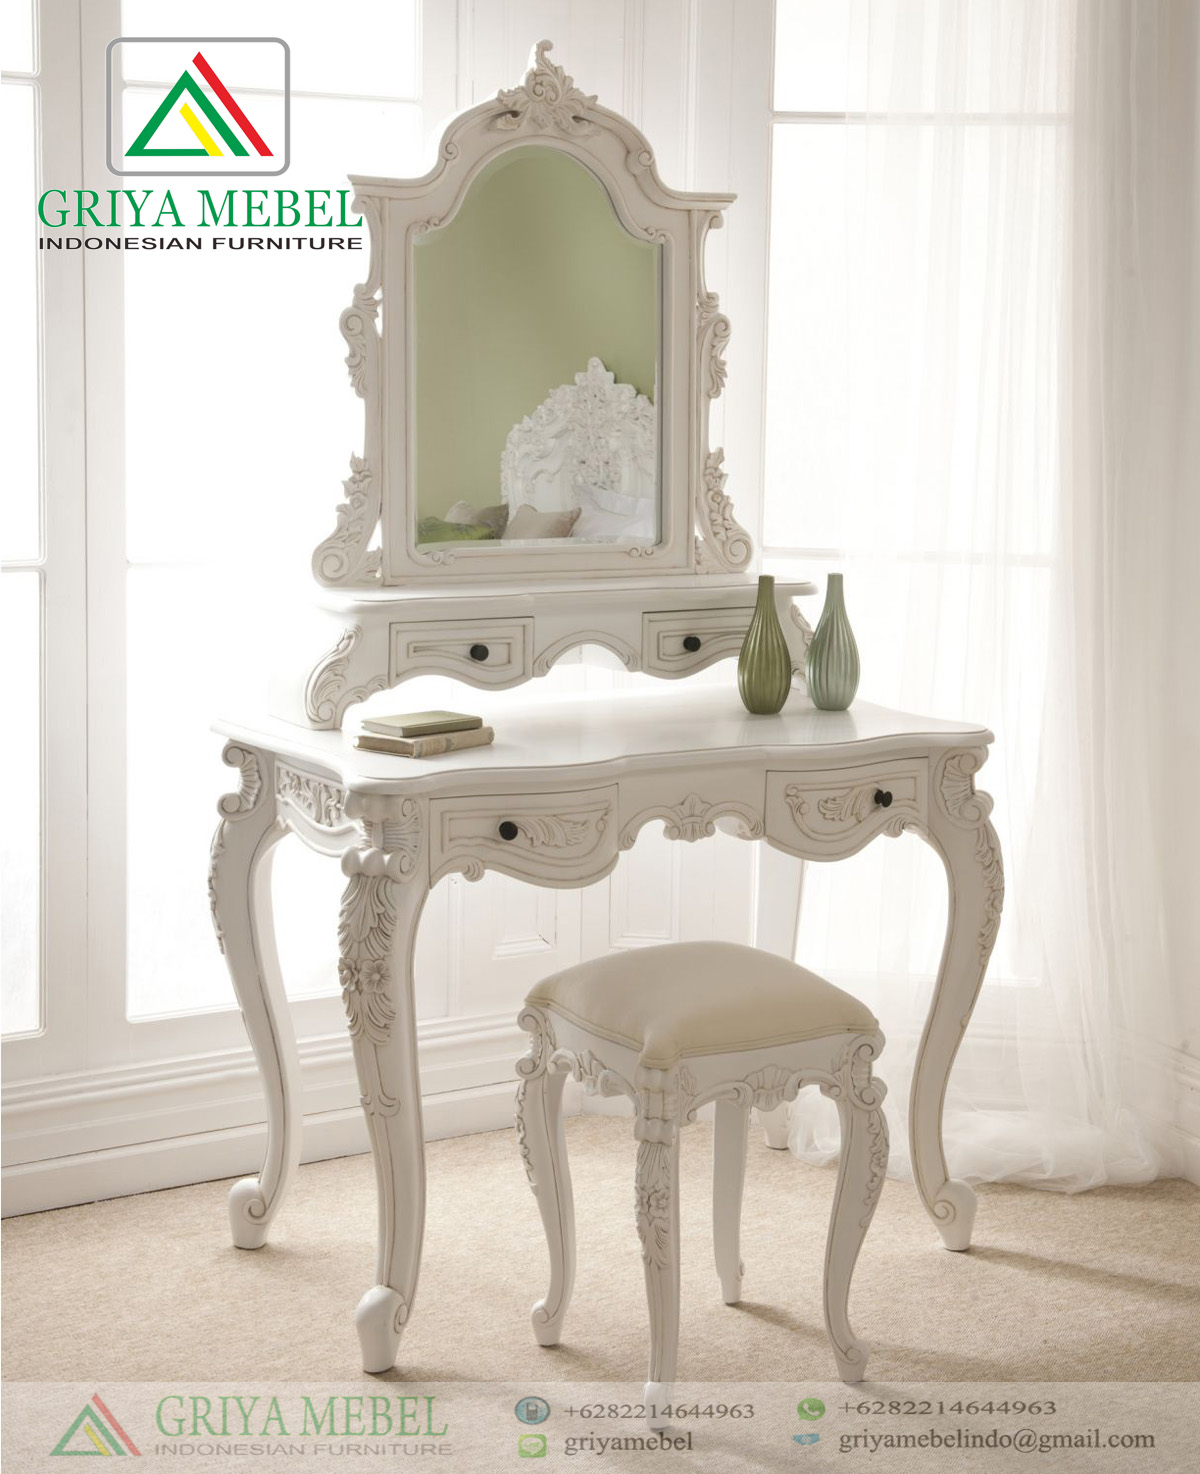 Meja Rias French Rococo Putih Doff Griya Mebel